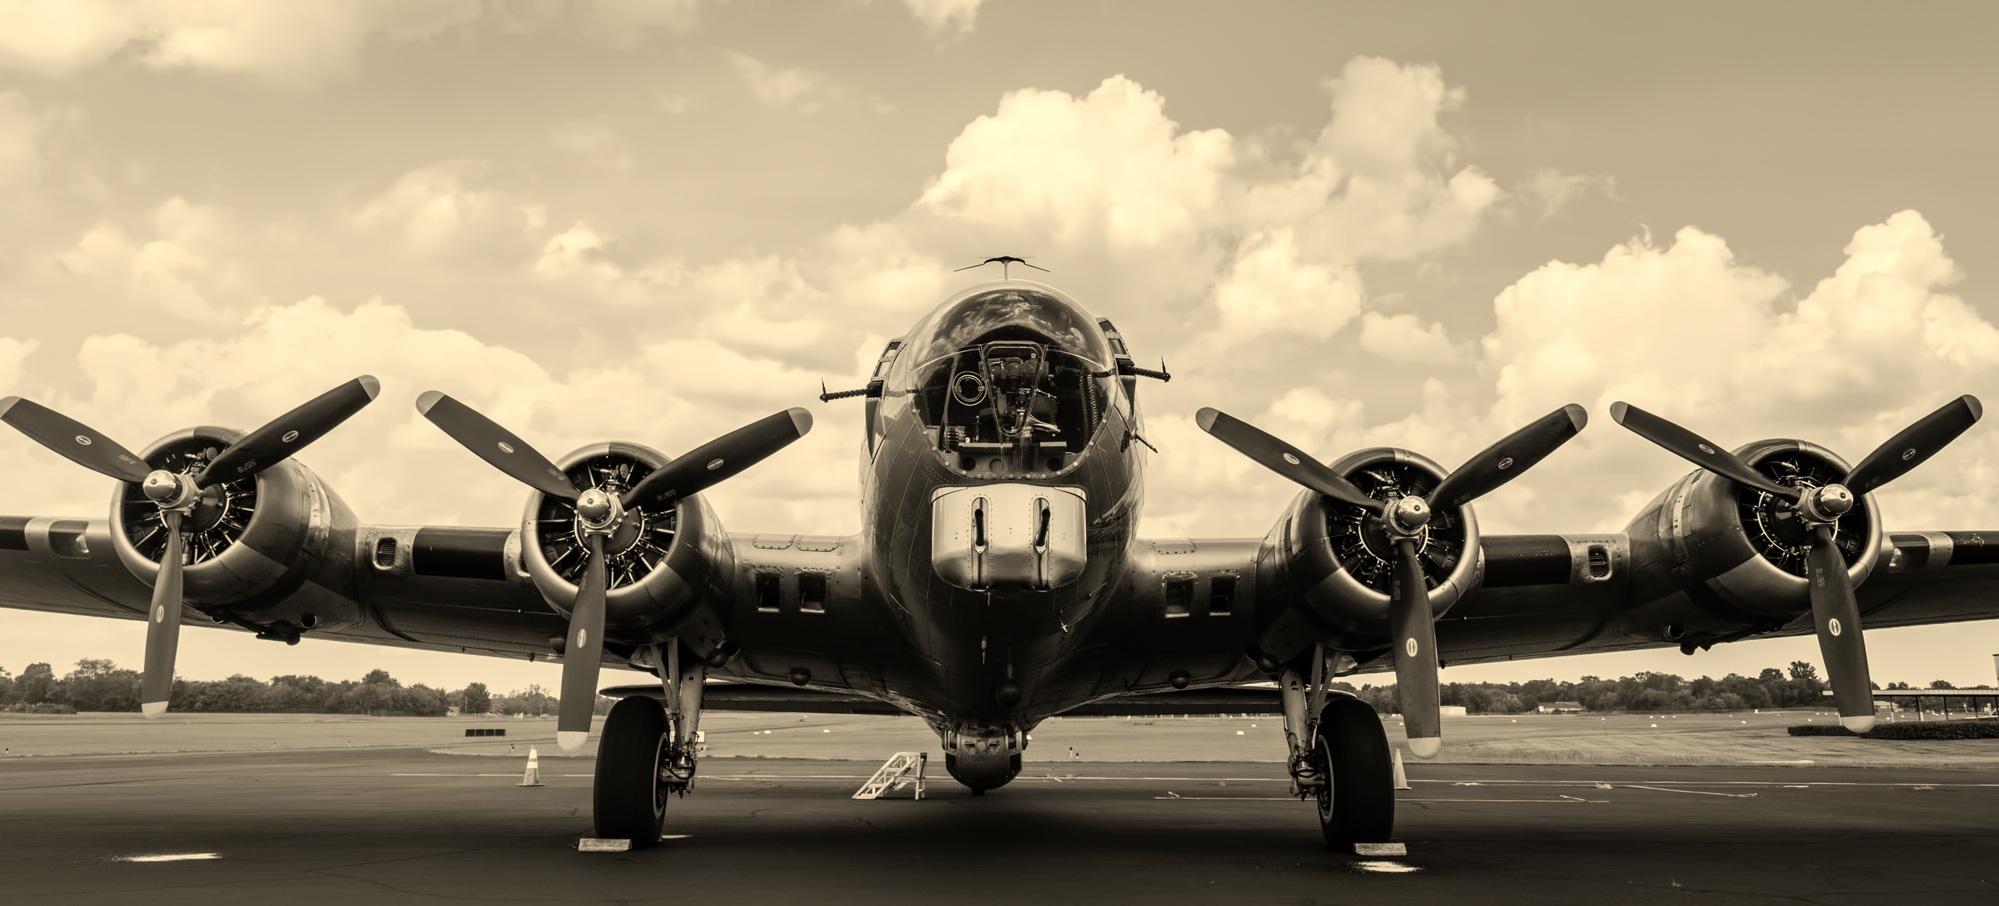 airplane-2507504